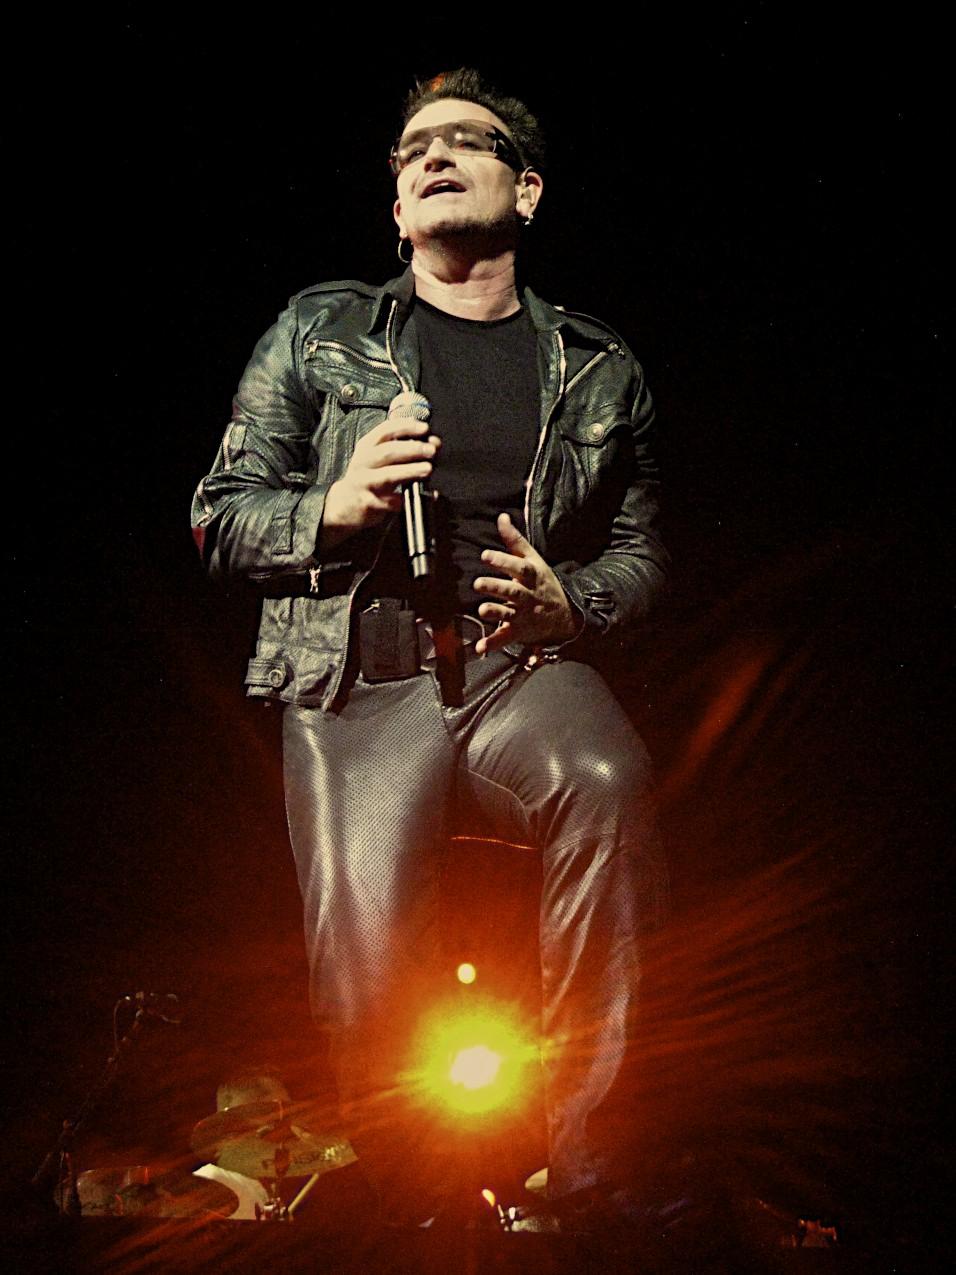 Bono/ U2TOURFANS / Nick Walker @